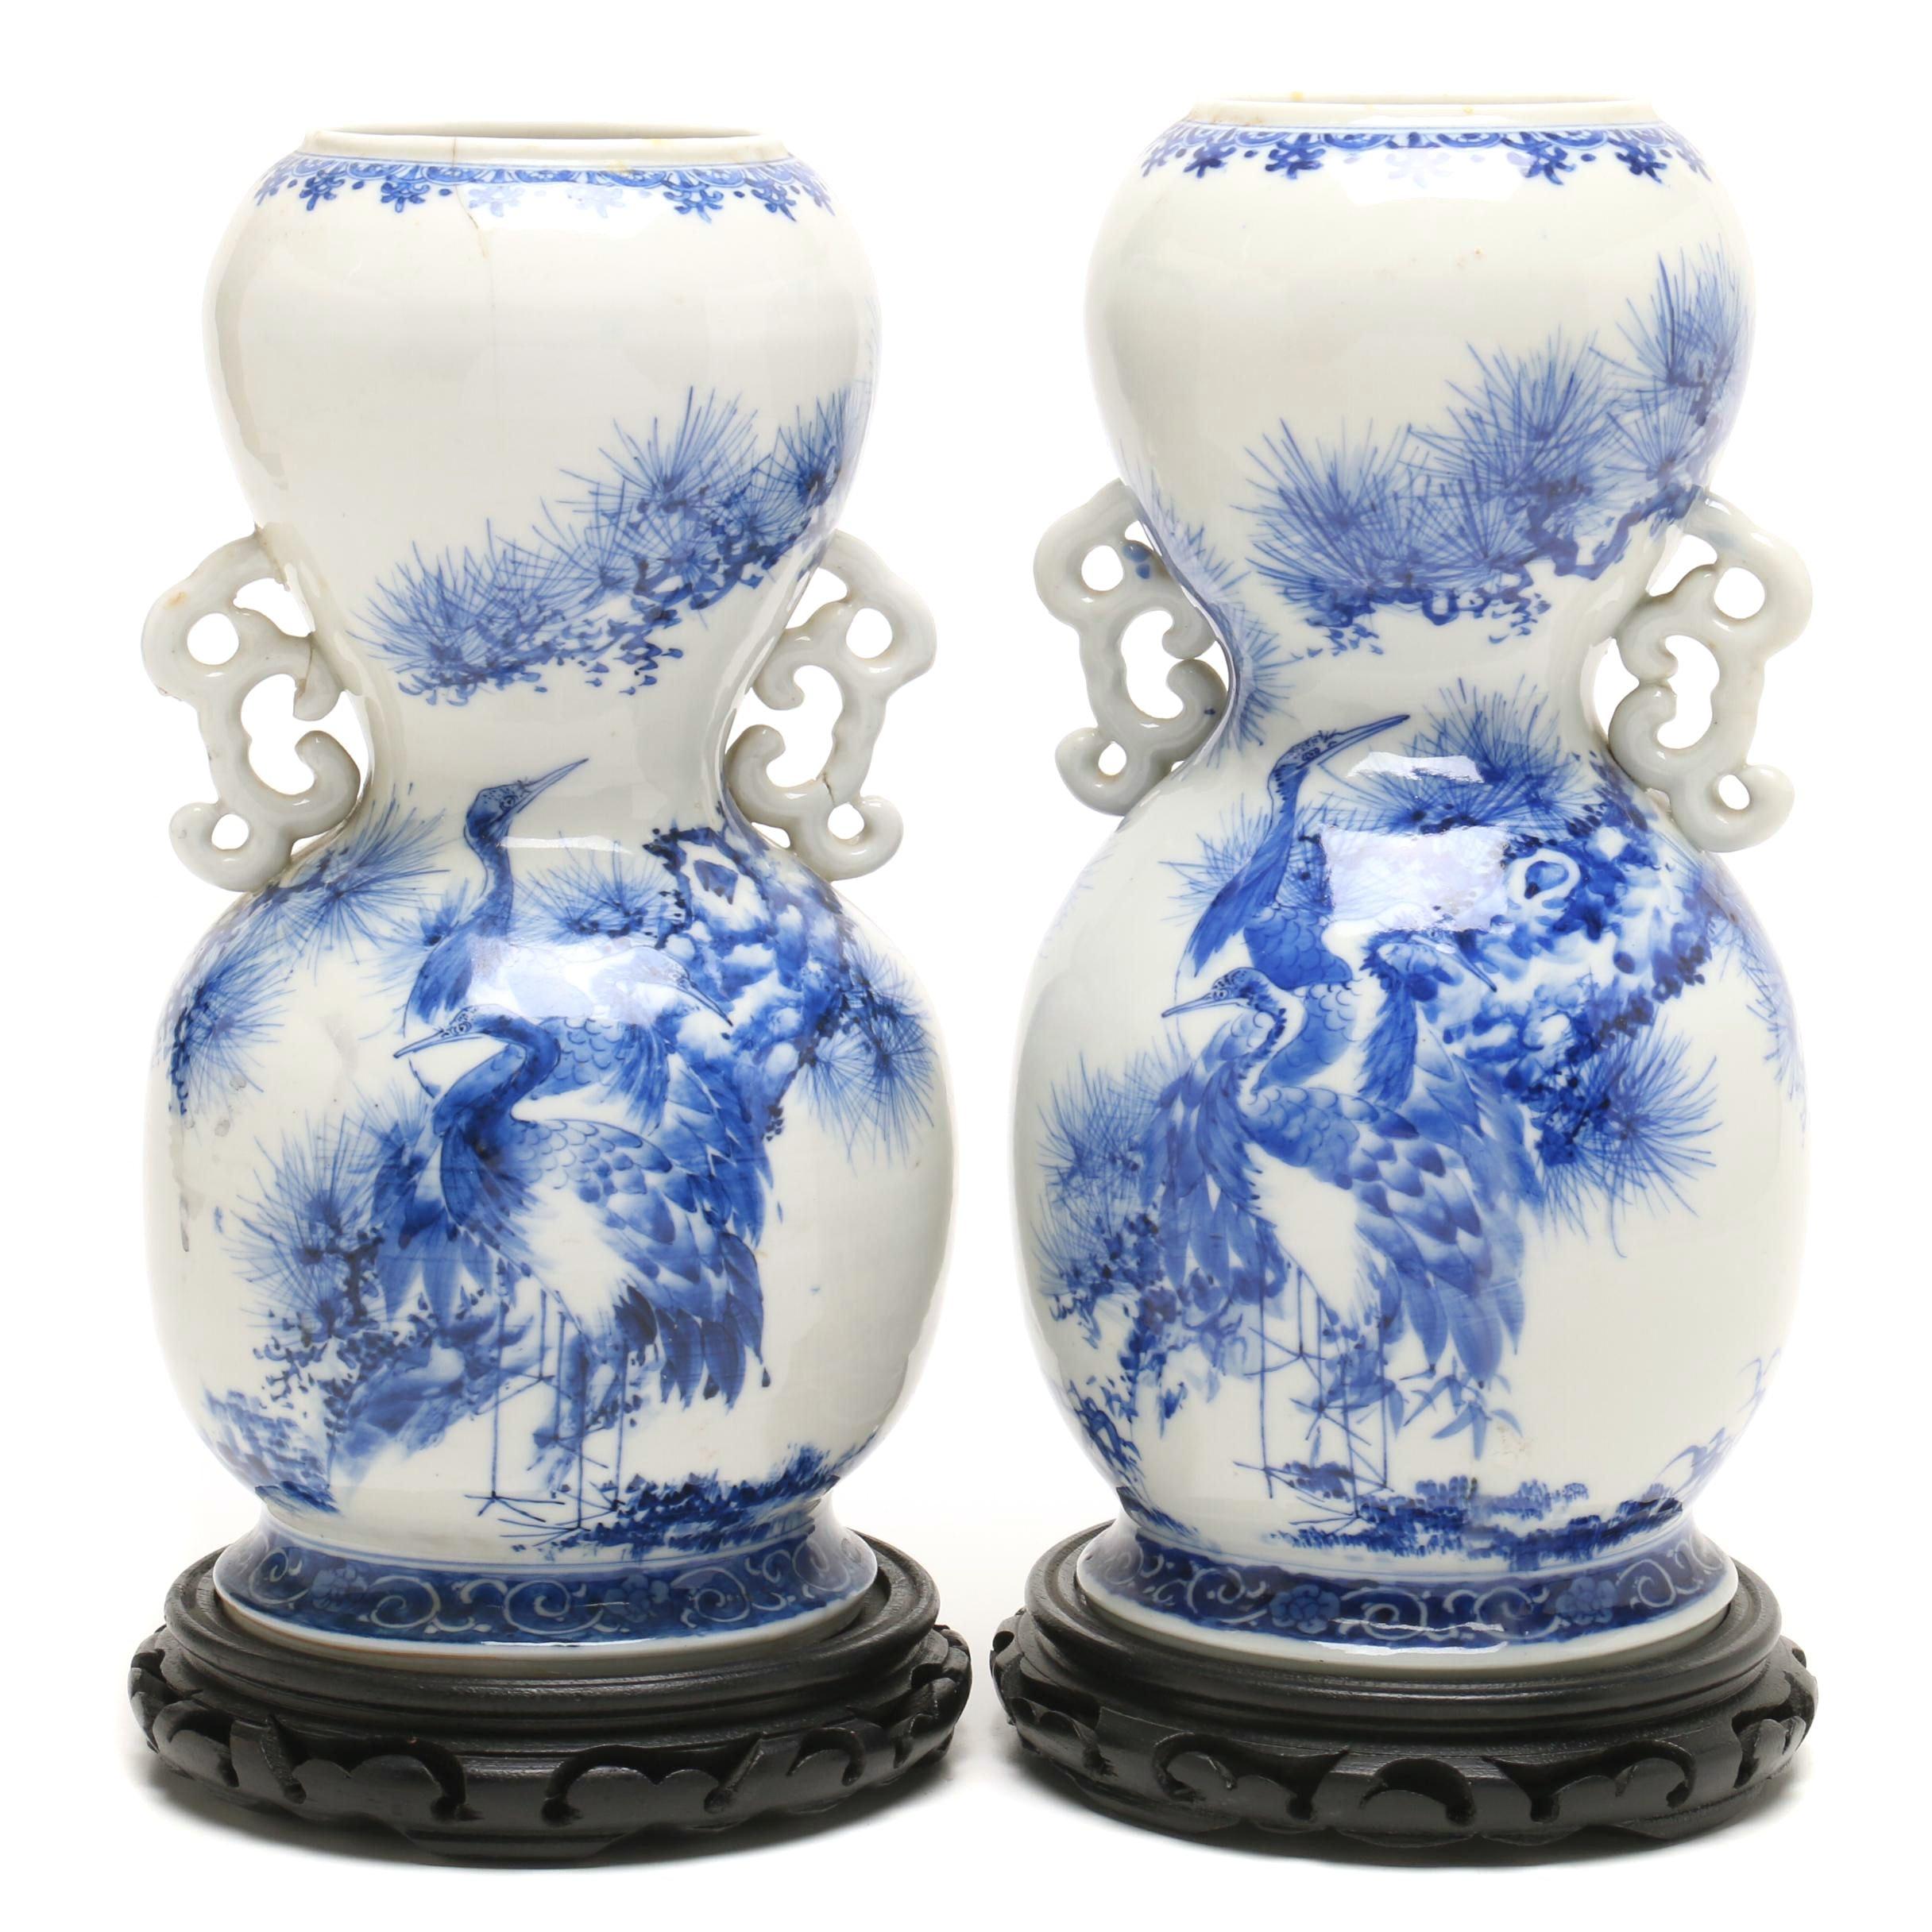 Japanese Seto Ware Vases